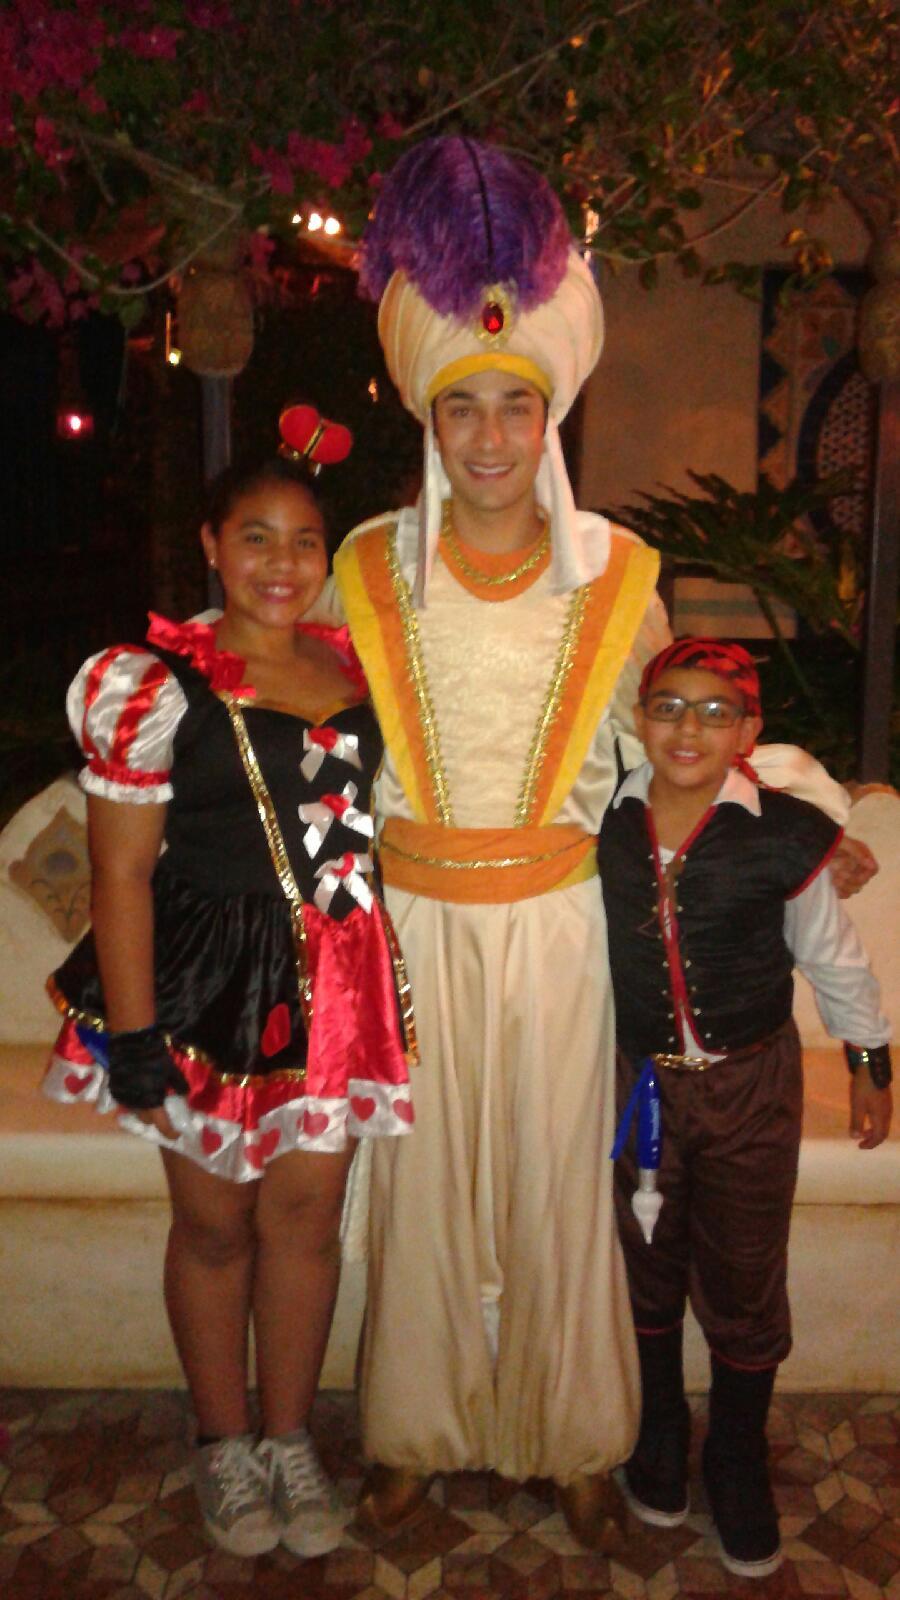 aladdin-mickeys-halloween-party.jpg